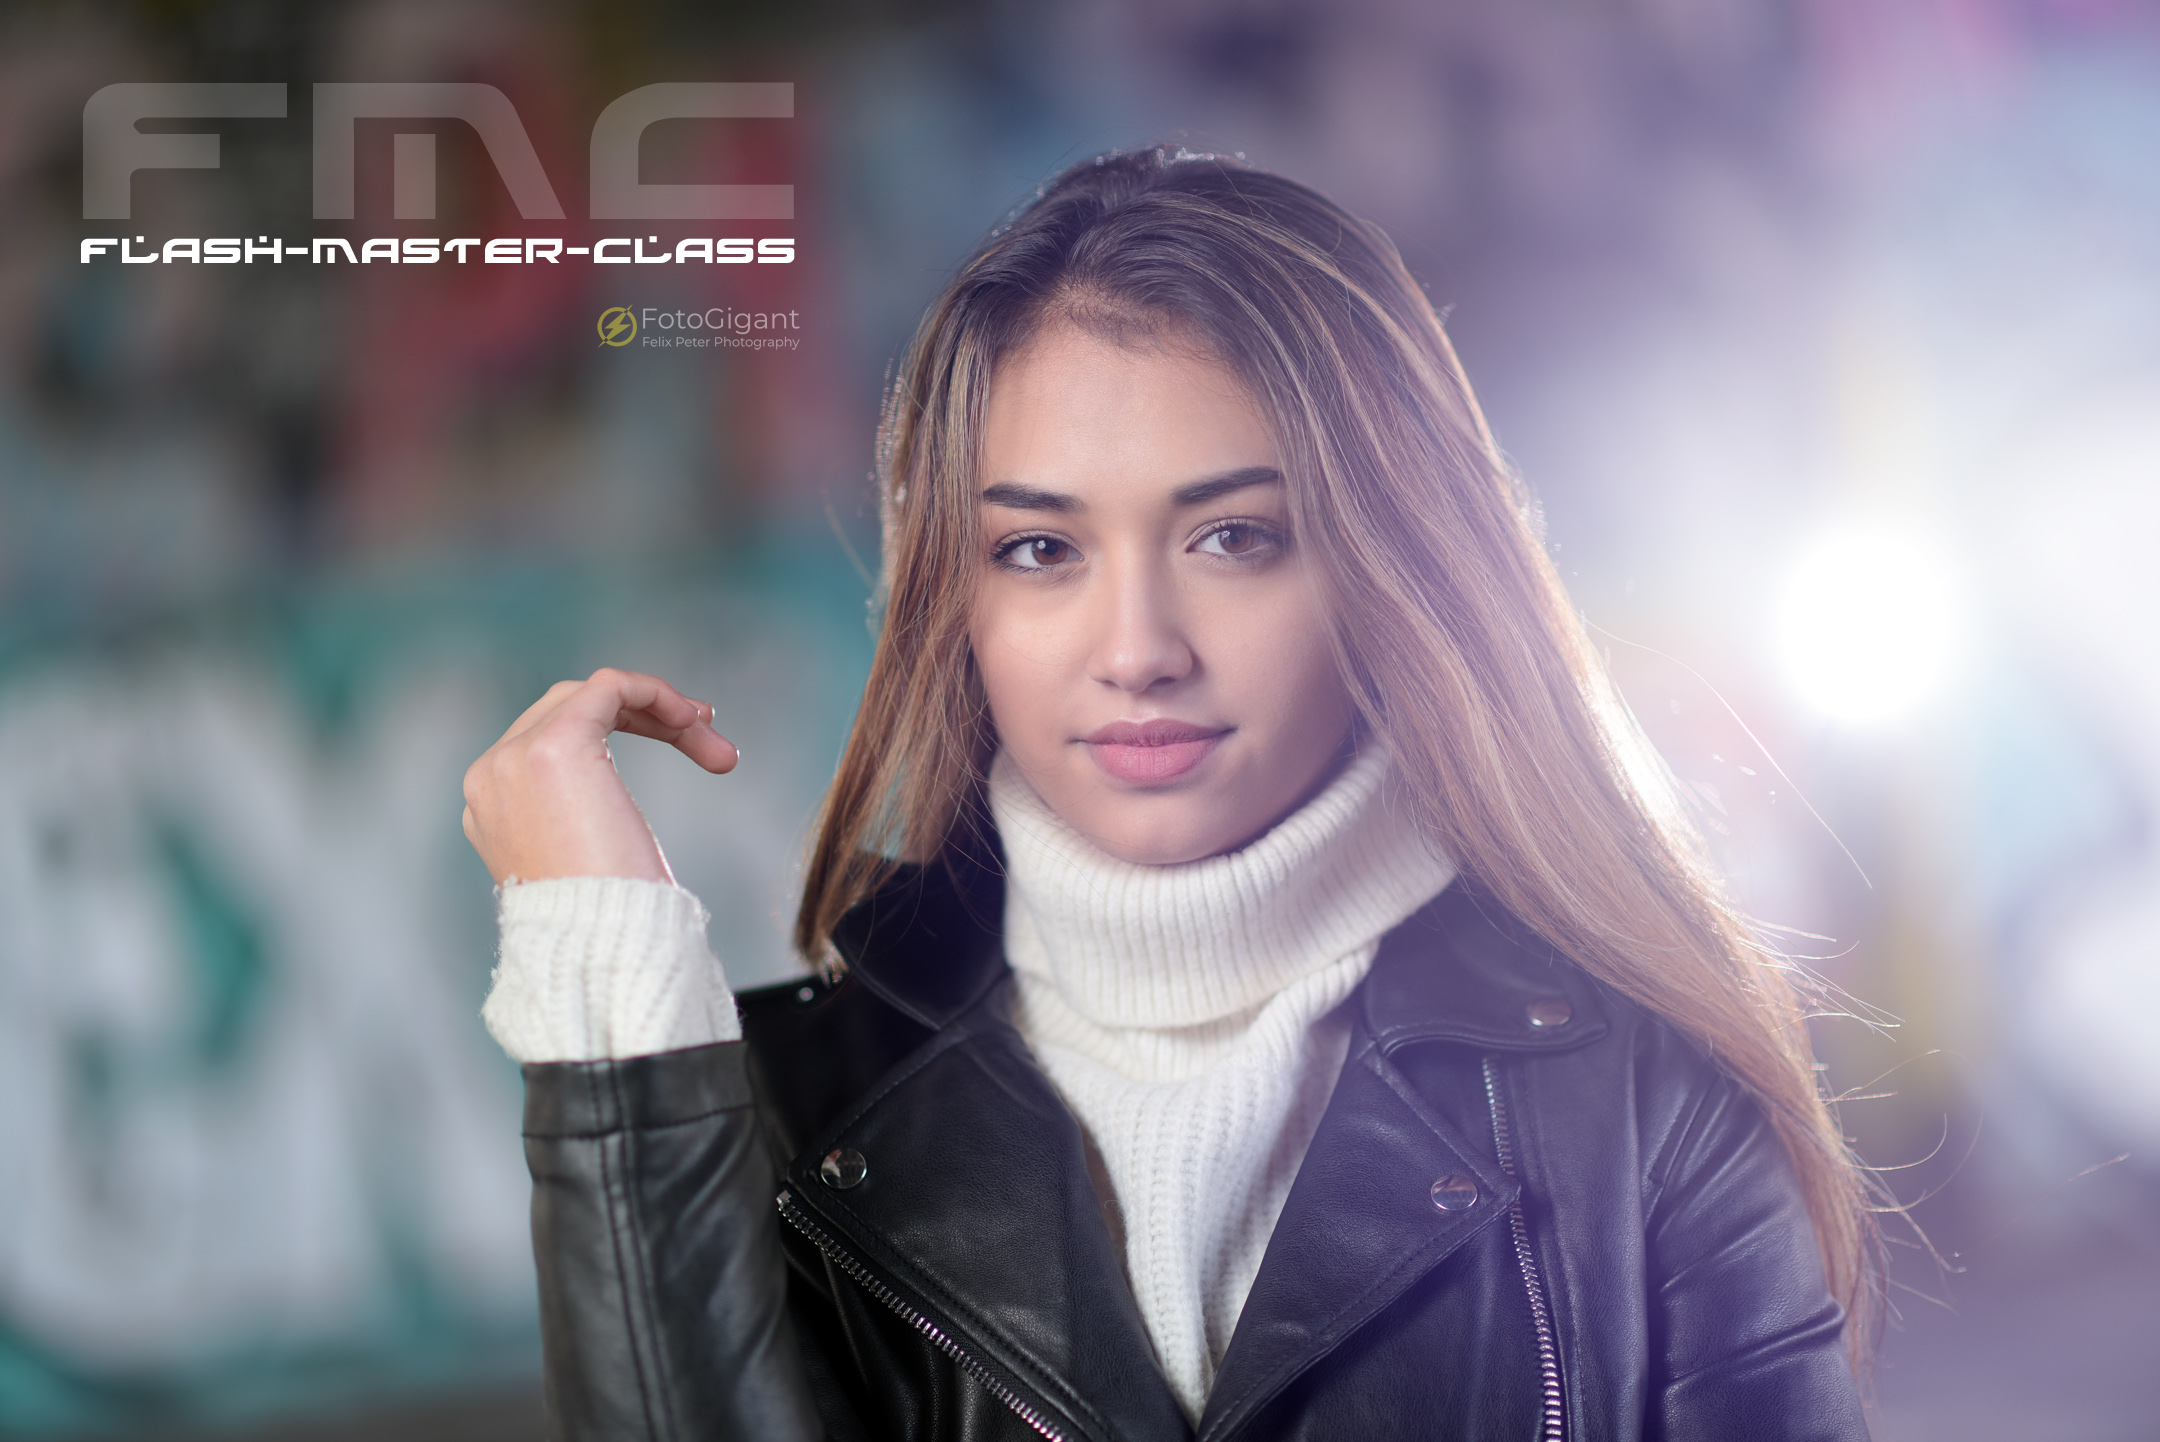 Flash-Masterclass_Fotokurs_03.jpg